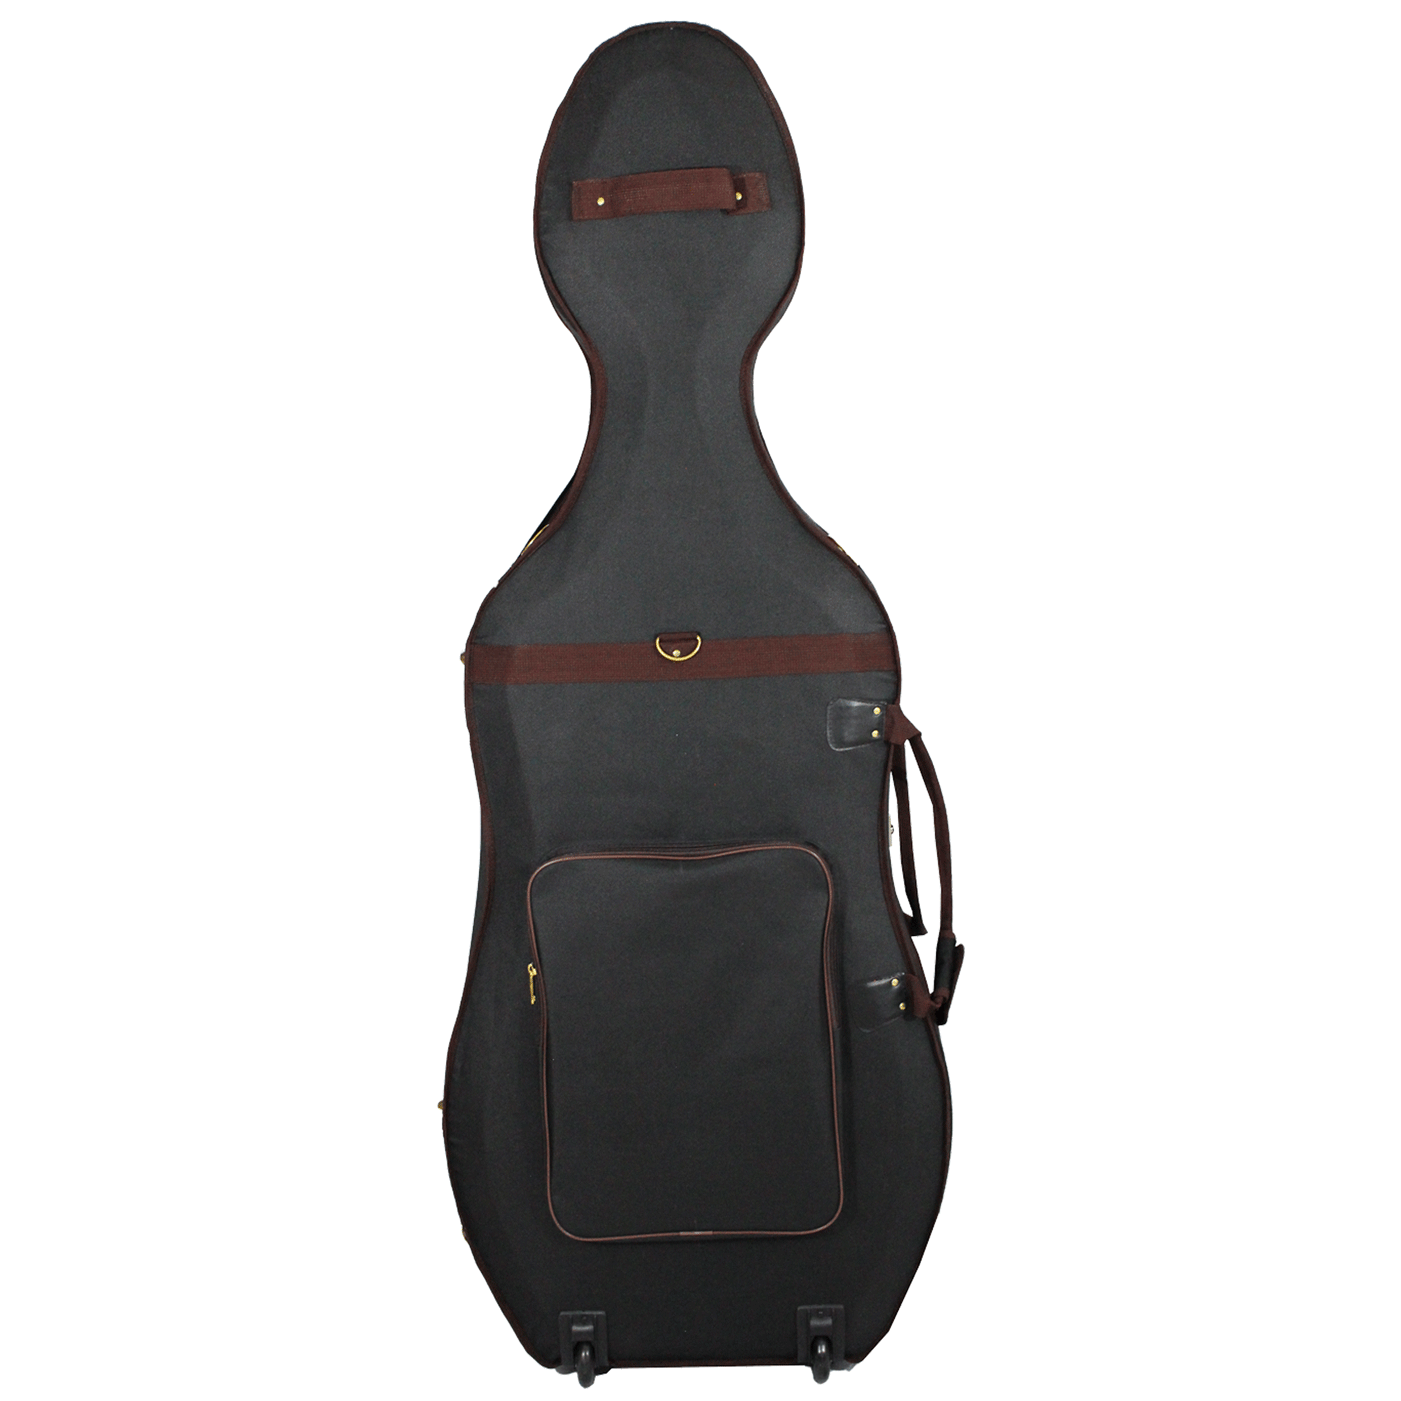 Estojo Case Cello Violoncelo 4/4 Térmico Luxo